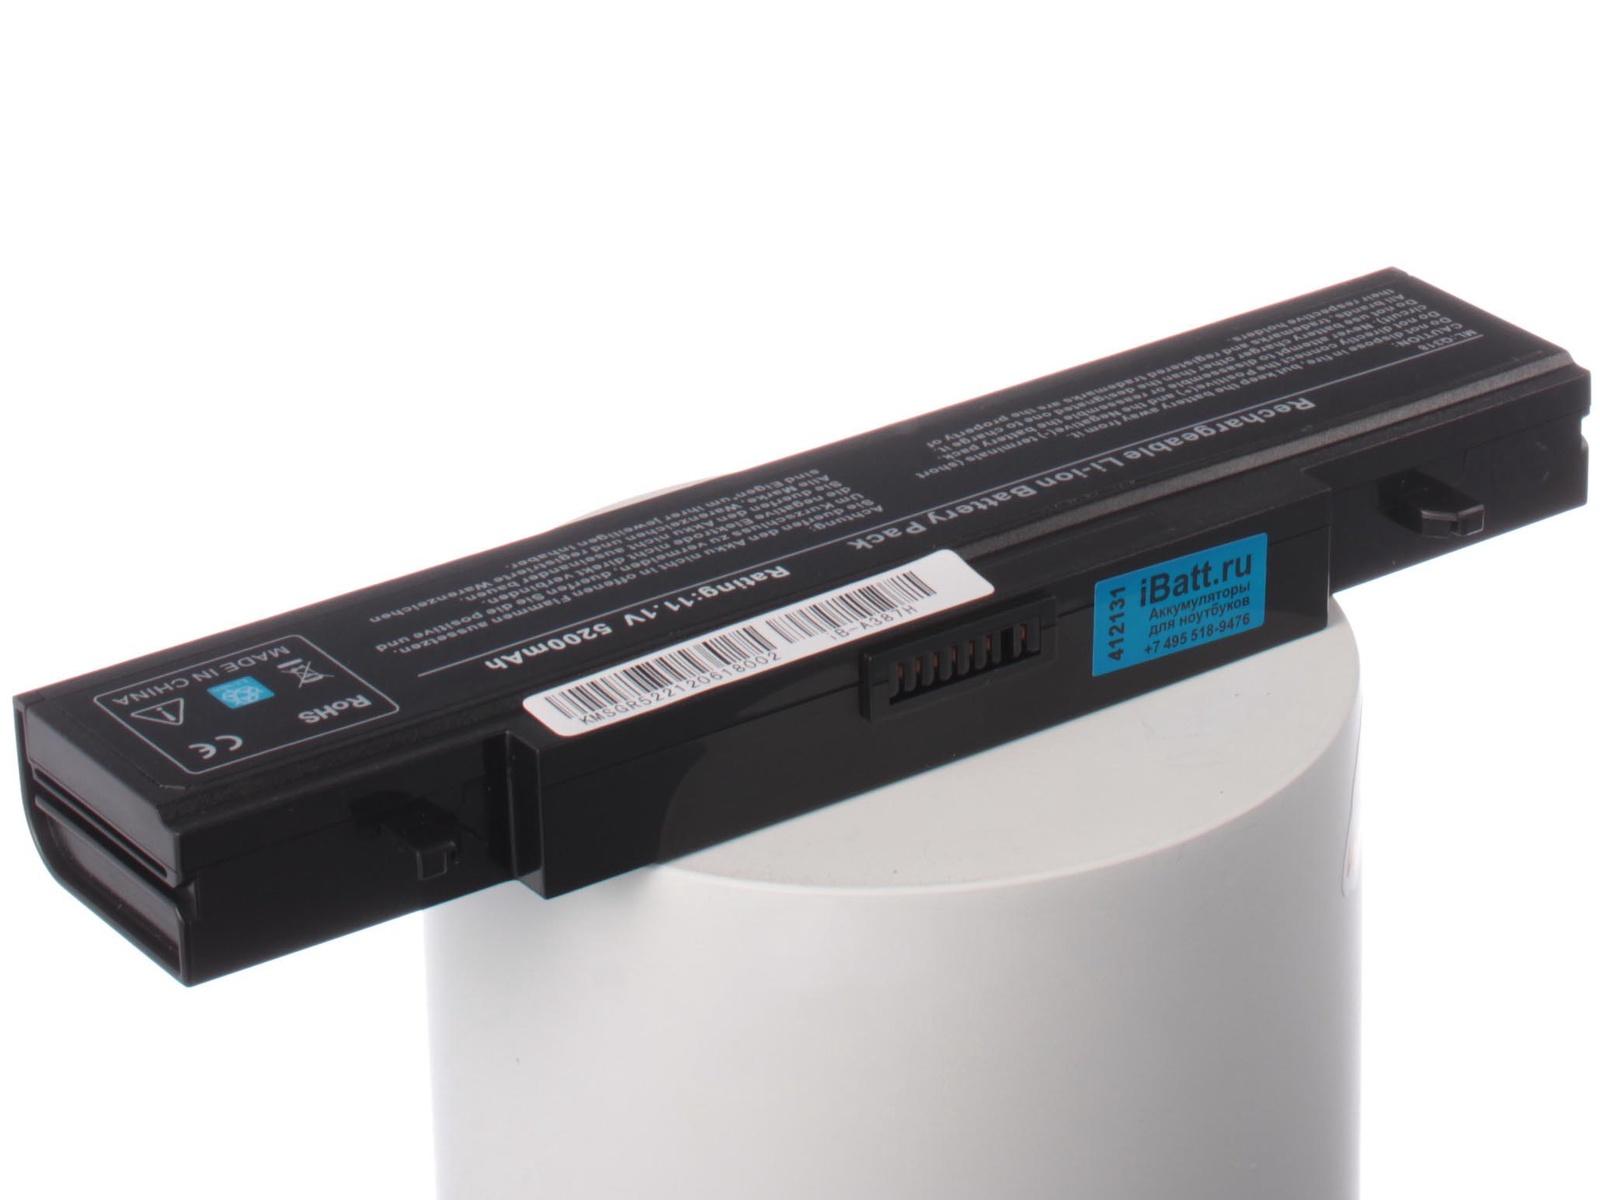 Аккумулятор для ноутбука iBatt для Samsung R580-JT01, RF711-S03, 300V5A-S17, 305E5A-S07, 305E5A-S0D, NP355V5C-A01, RC530-S0B, RF511-S05, RV520-S07, 305V5A-S07, 350V5C-S0U, R519-JS01, R525-JT06, RC520-S02, RF511-S01, RF711-S01 аккумулятор для ноутбука anybatt для samsung np q430 rf711 s03 np355v5c a01 rc530 s0b rf511 s05 rv520 s07 rc520 s02 rf511 s01 rf711 s01 rv520 s03 r440 ja04 rc730 s02 rv520 s01 rv520 s0a rv709 np270e5e x05 rc510 s04